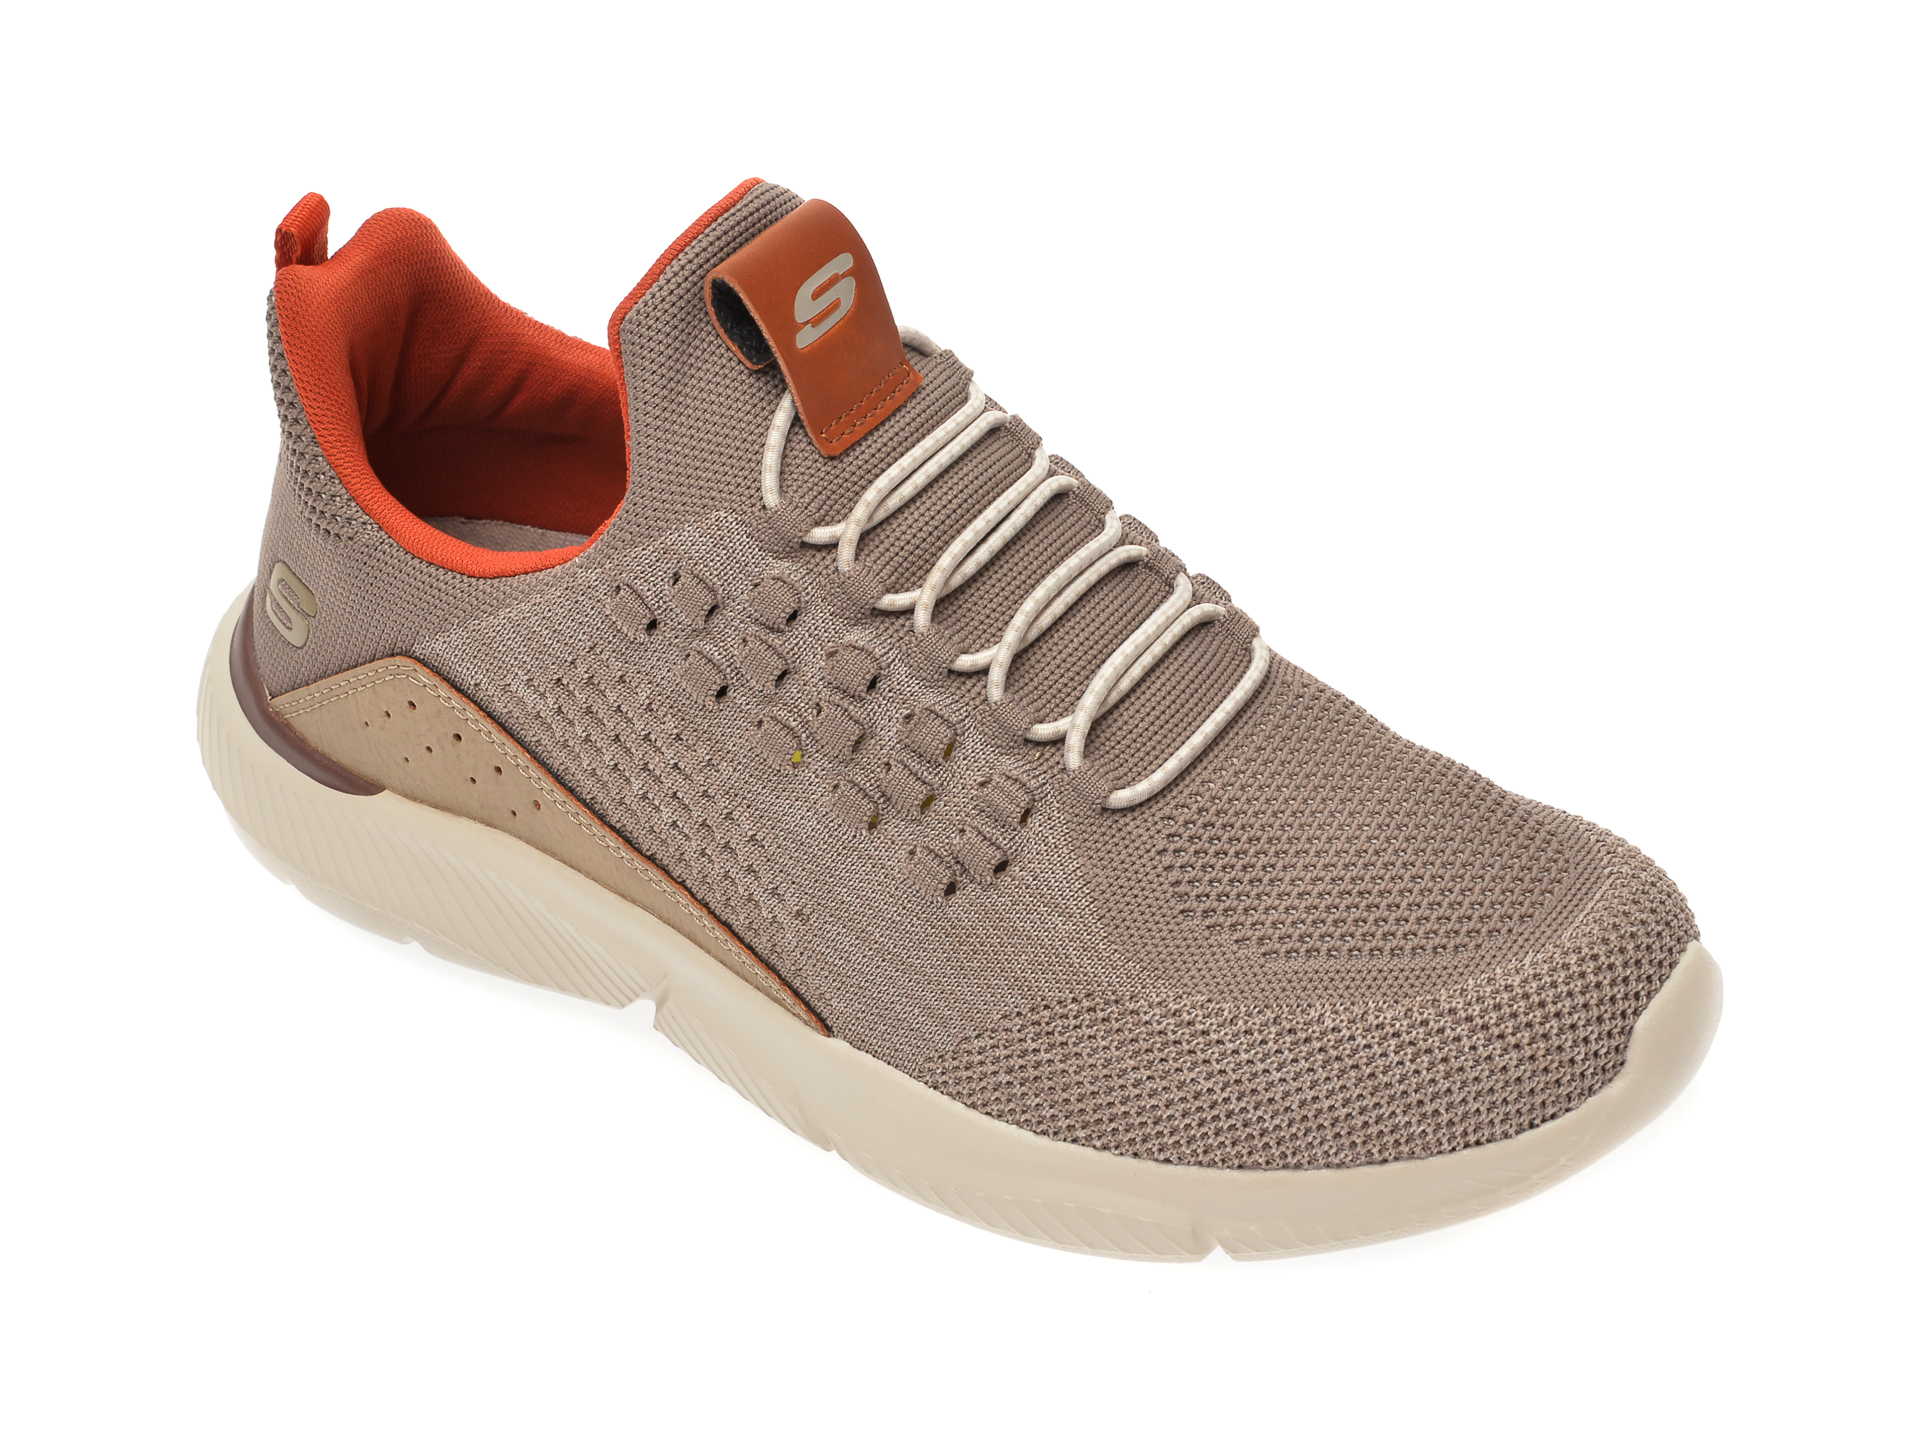 Pantofi sport SKECHERS maro Ingram Streetway, din material textil imagine